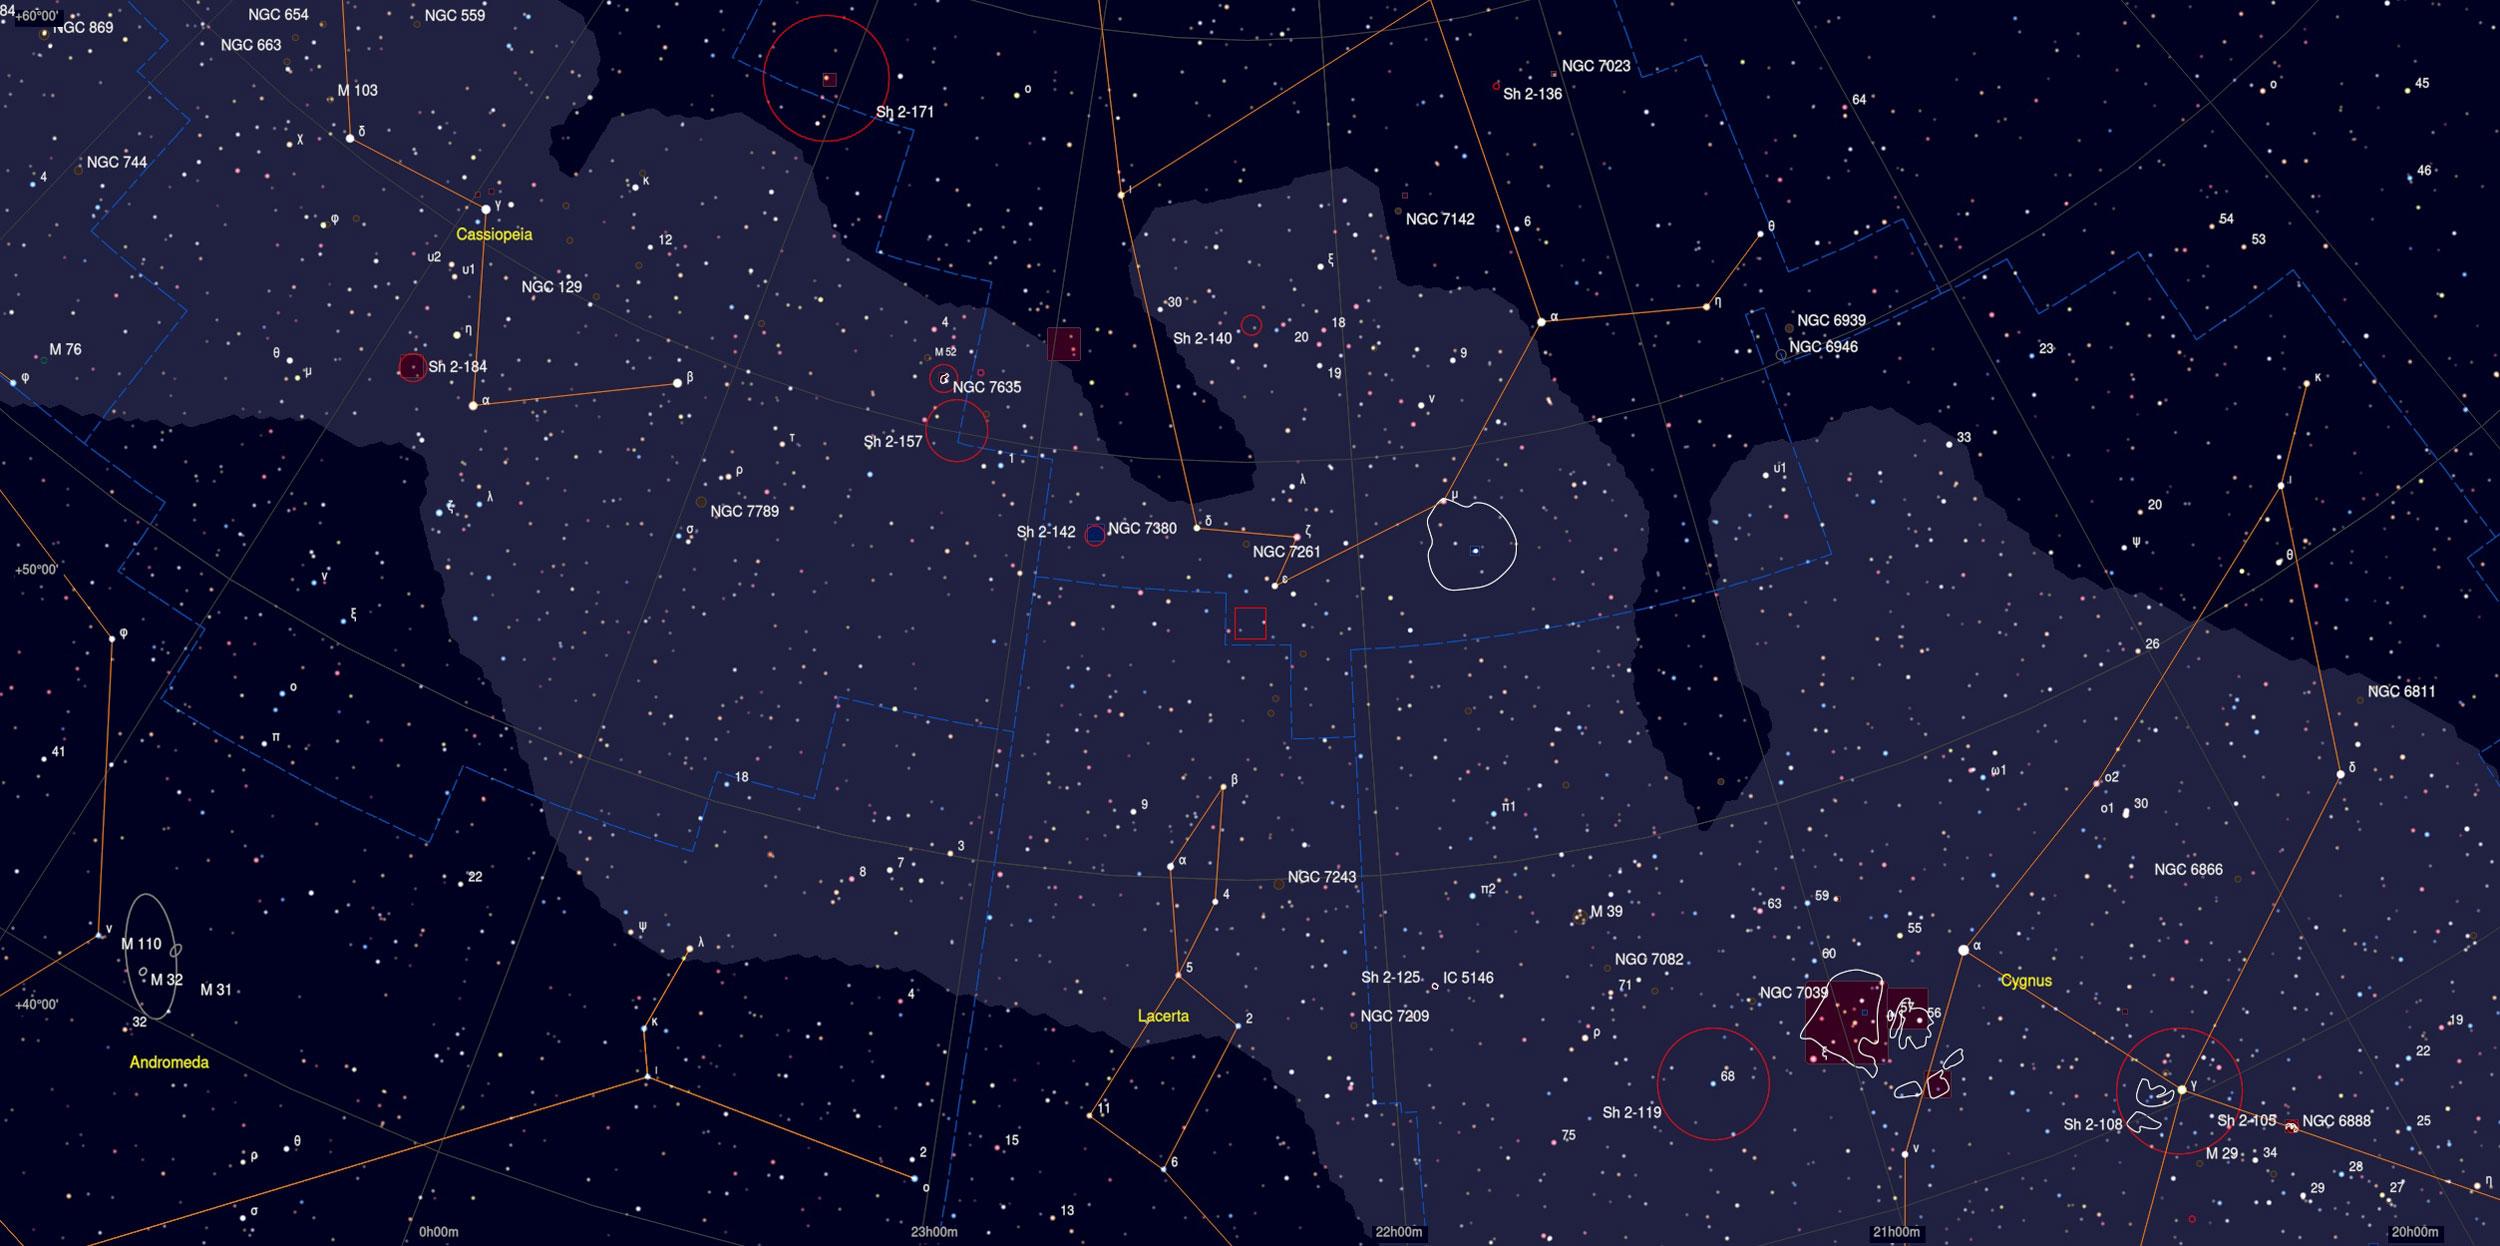 Sh2-132 Sky Chart - Astrophotography Martin Rusterholz